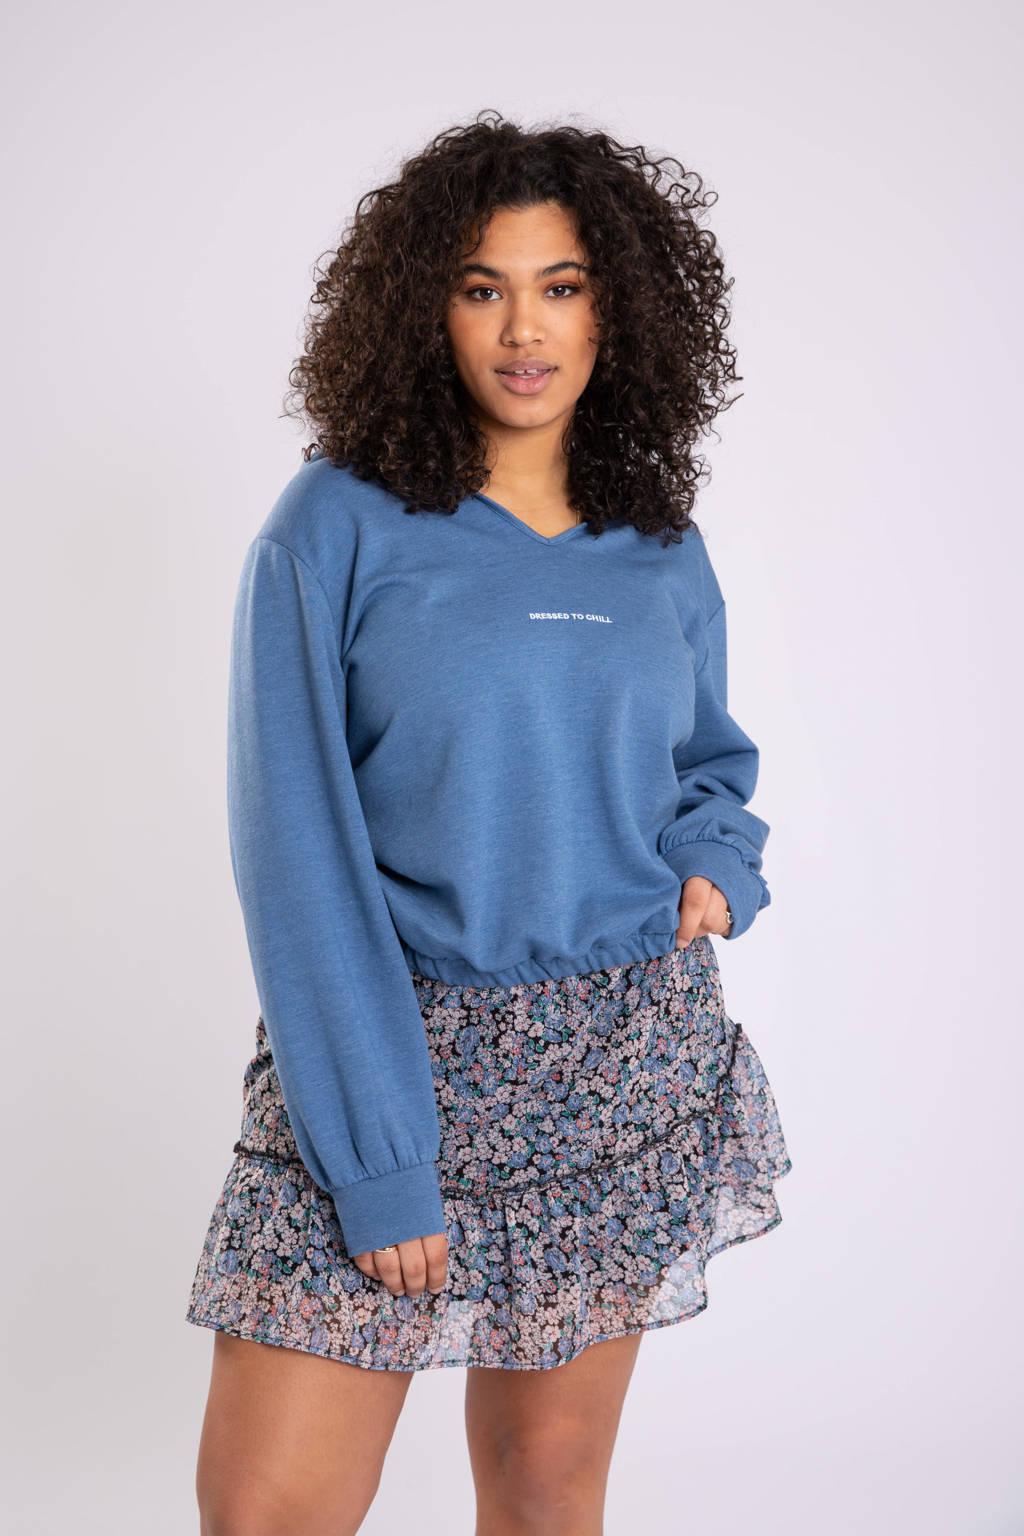 MS Mode gemêleerde hoodie blauw/wit, Blauw/wit